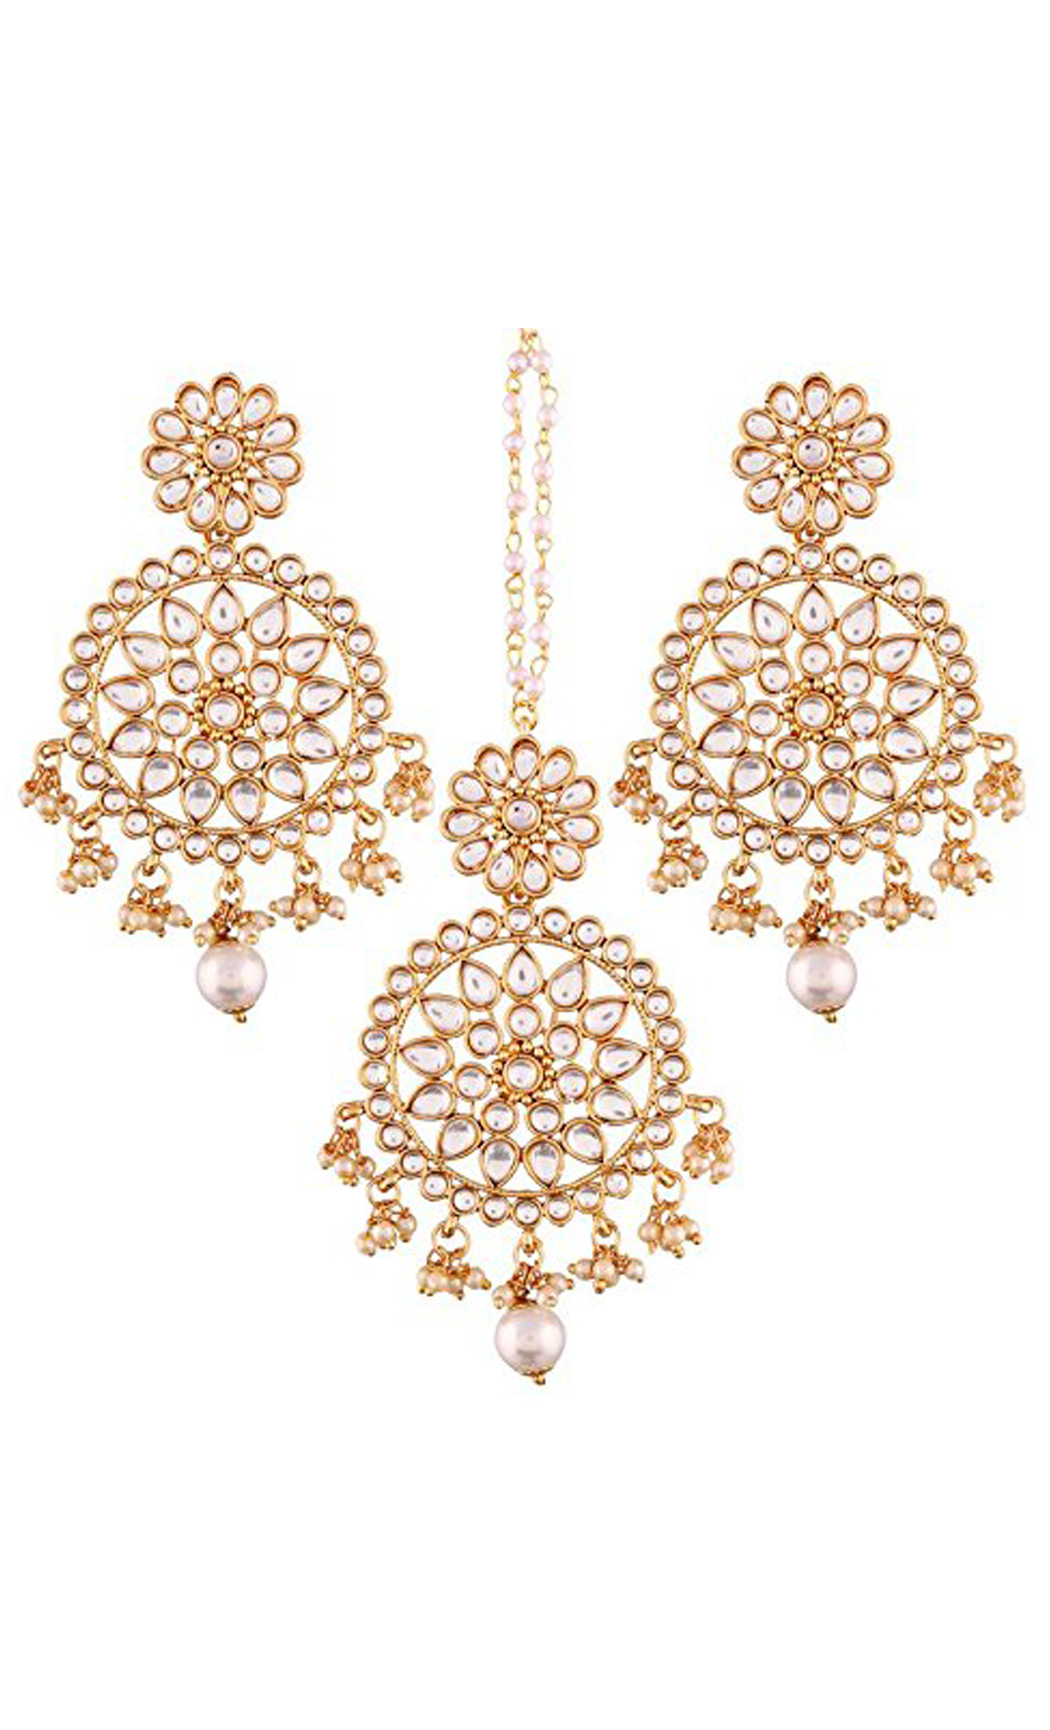 Kundan and Pearl Flower Pattern Chaandbali Earrings and Maang Tikka Gold Plated Set | Indian Bridal Jewellery Collection